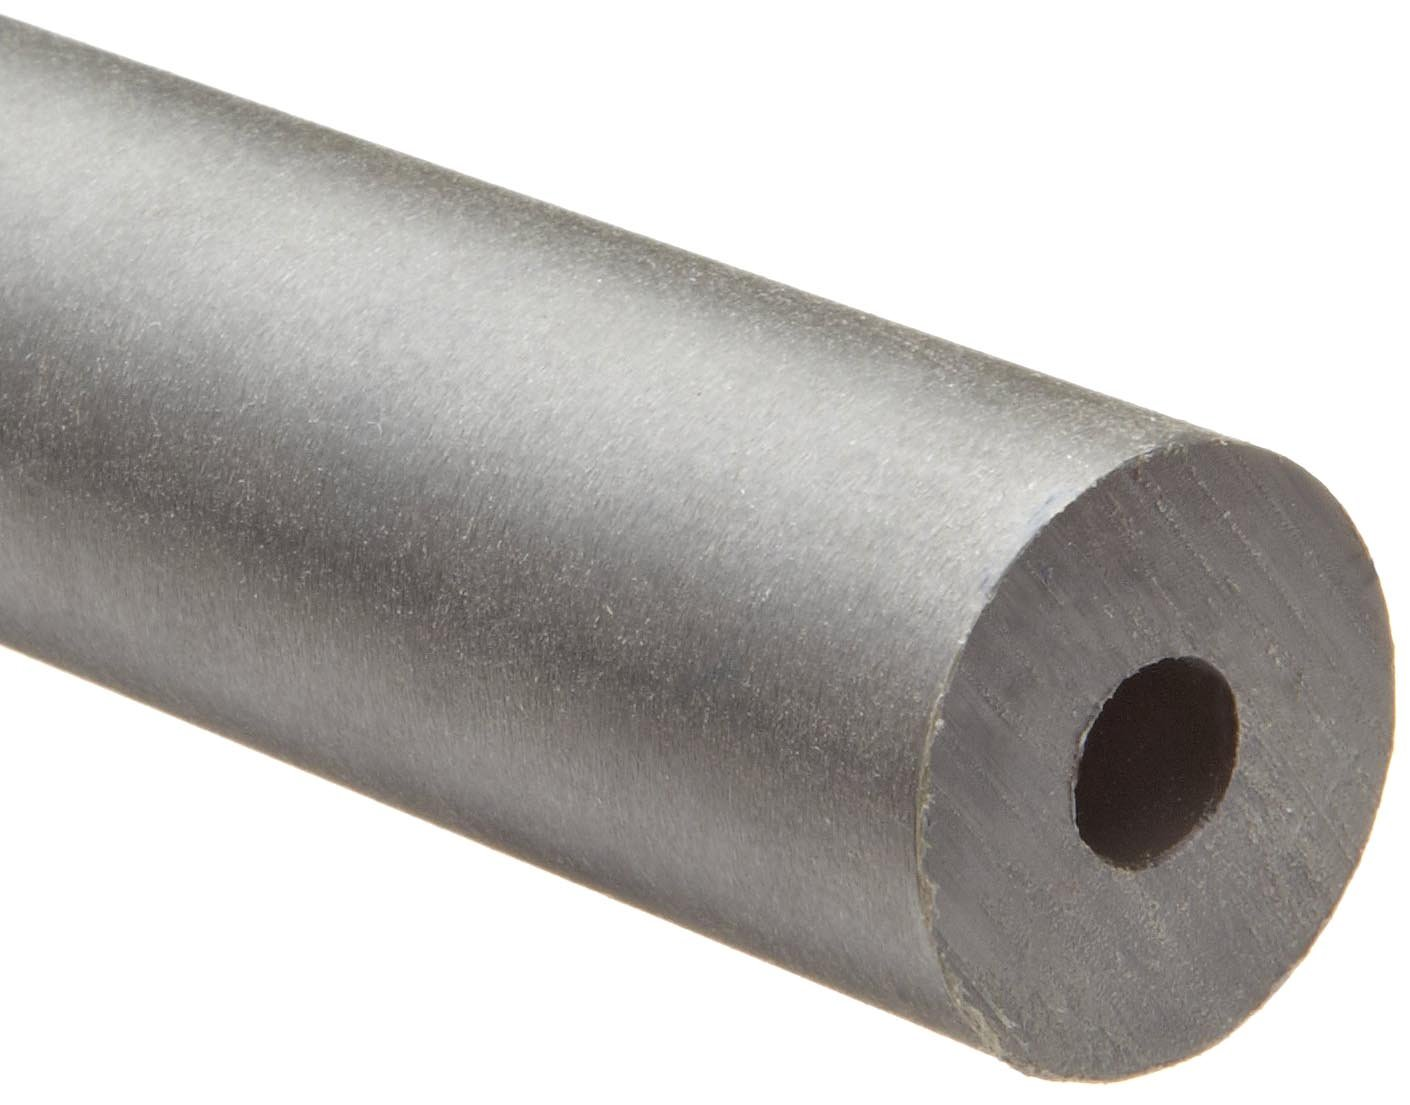 Gray Nylatron GS Nylon Round Tubing, 5/8'' OD, 3/8'' ID, 12'' Length